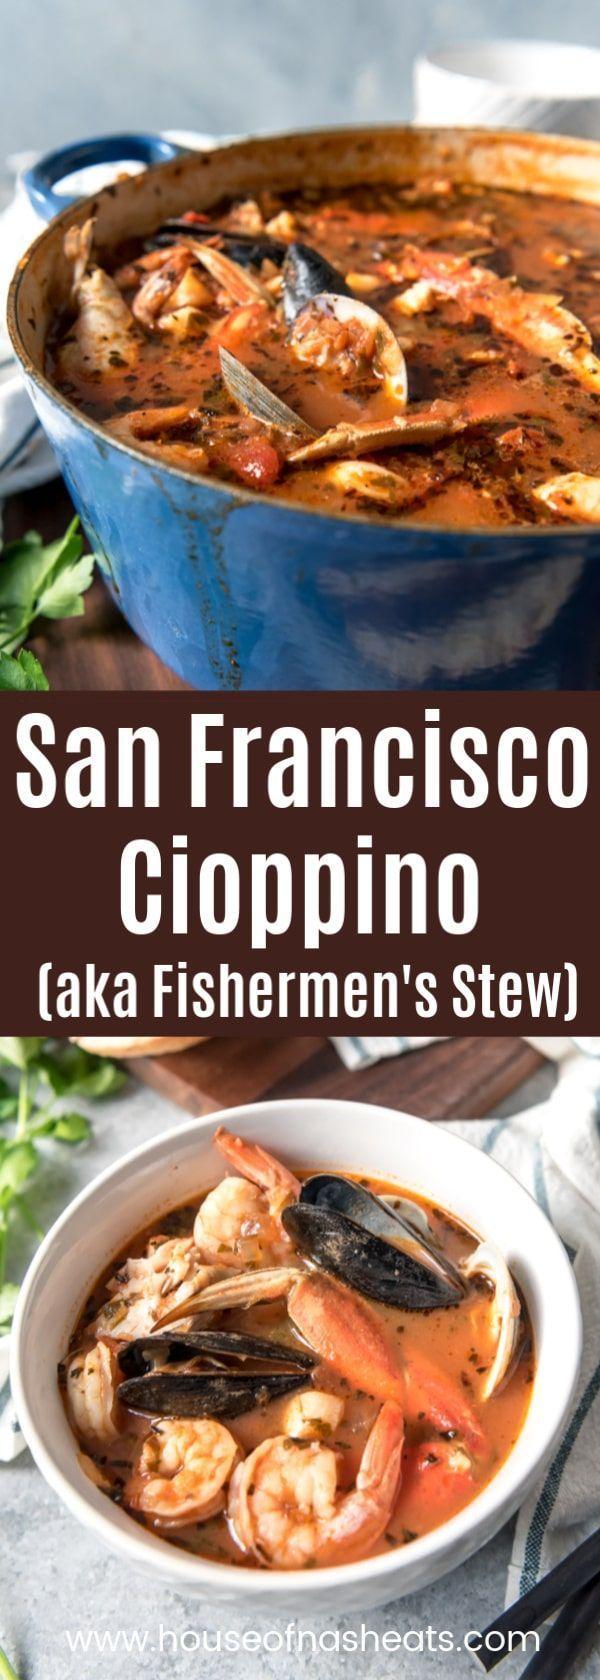 San Francisco Cioppino Seafood Stew - House of Nash Eats